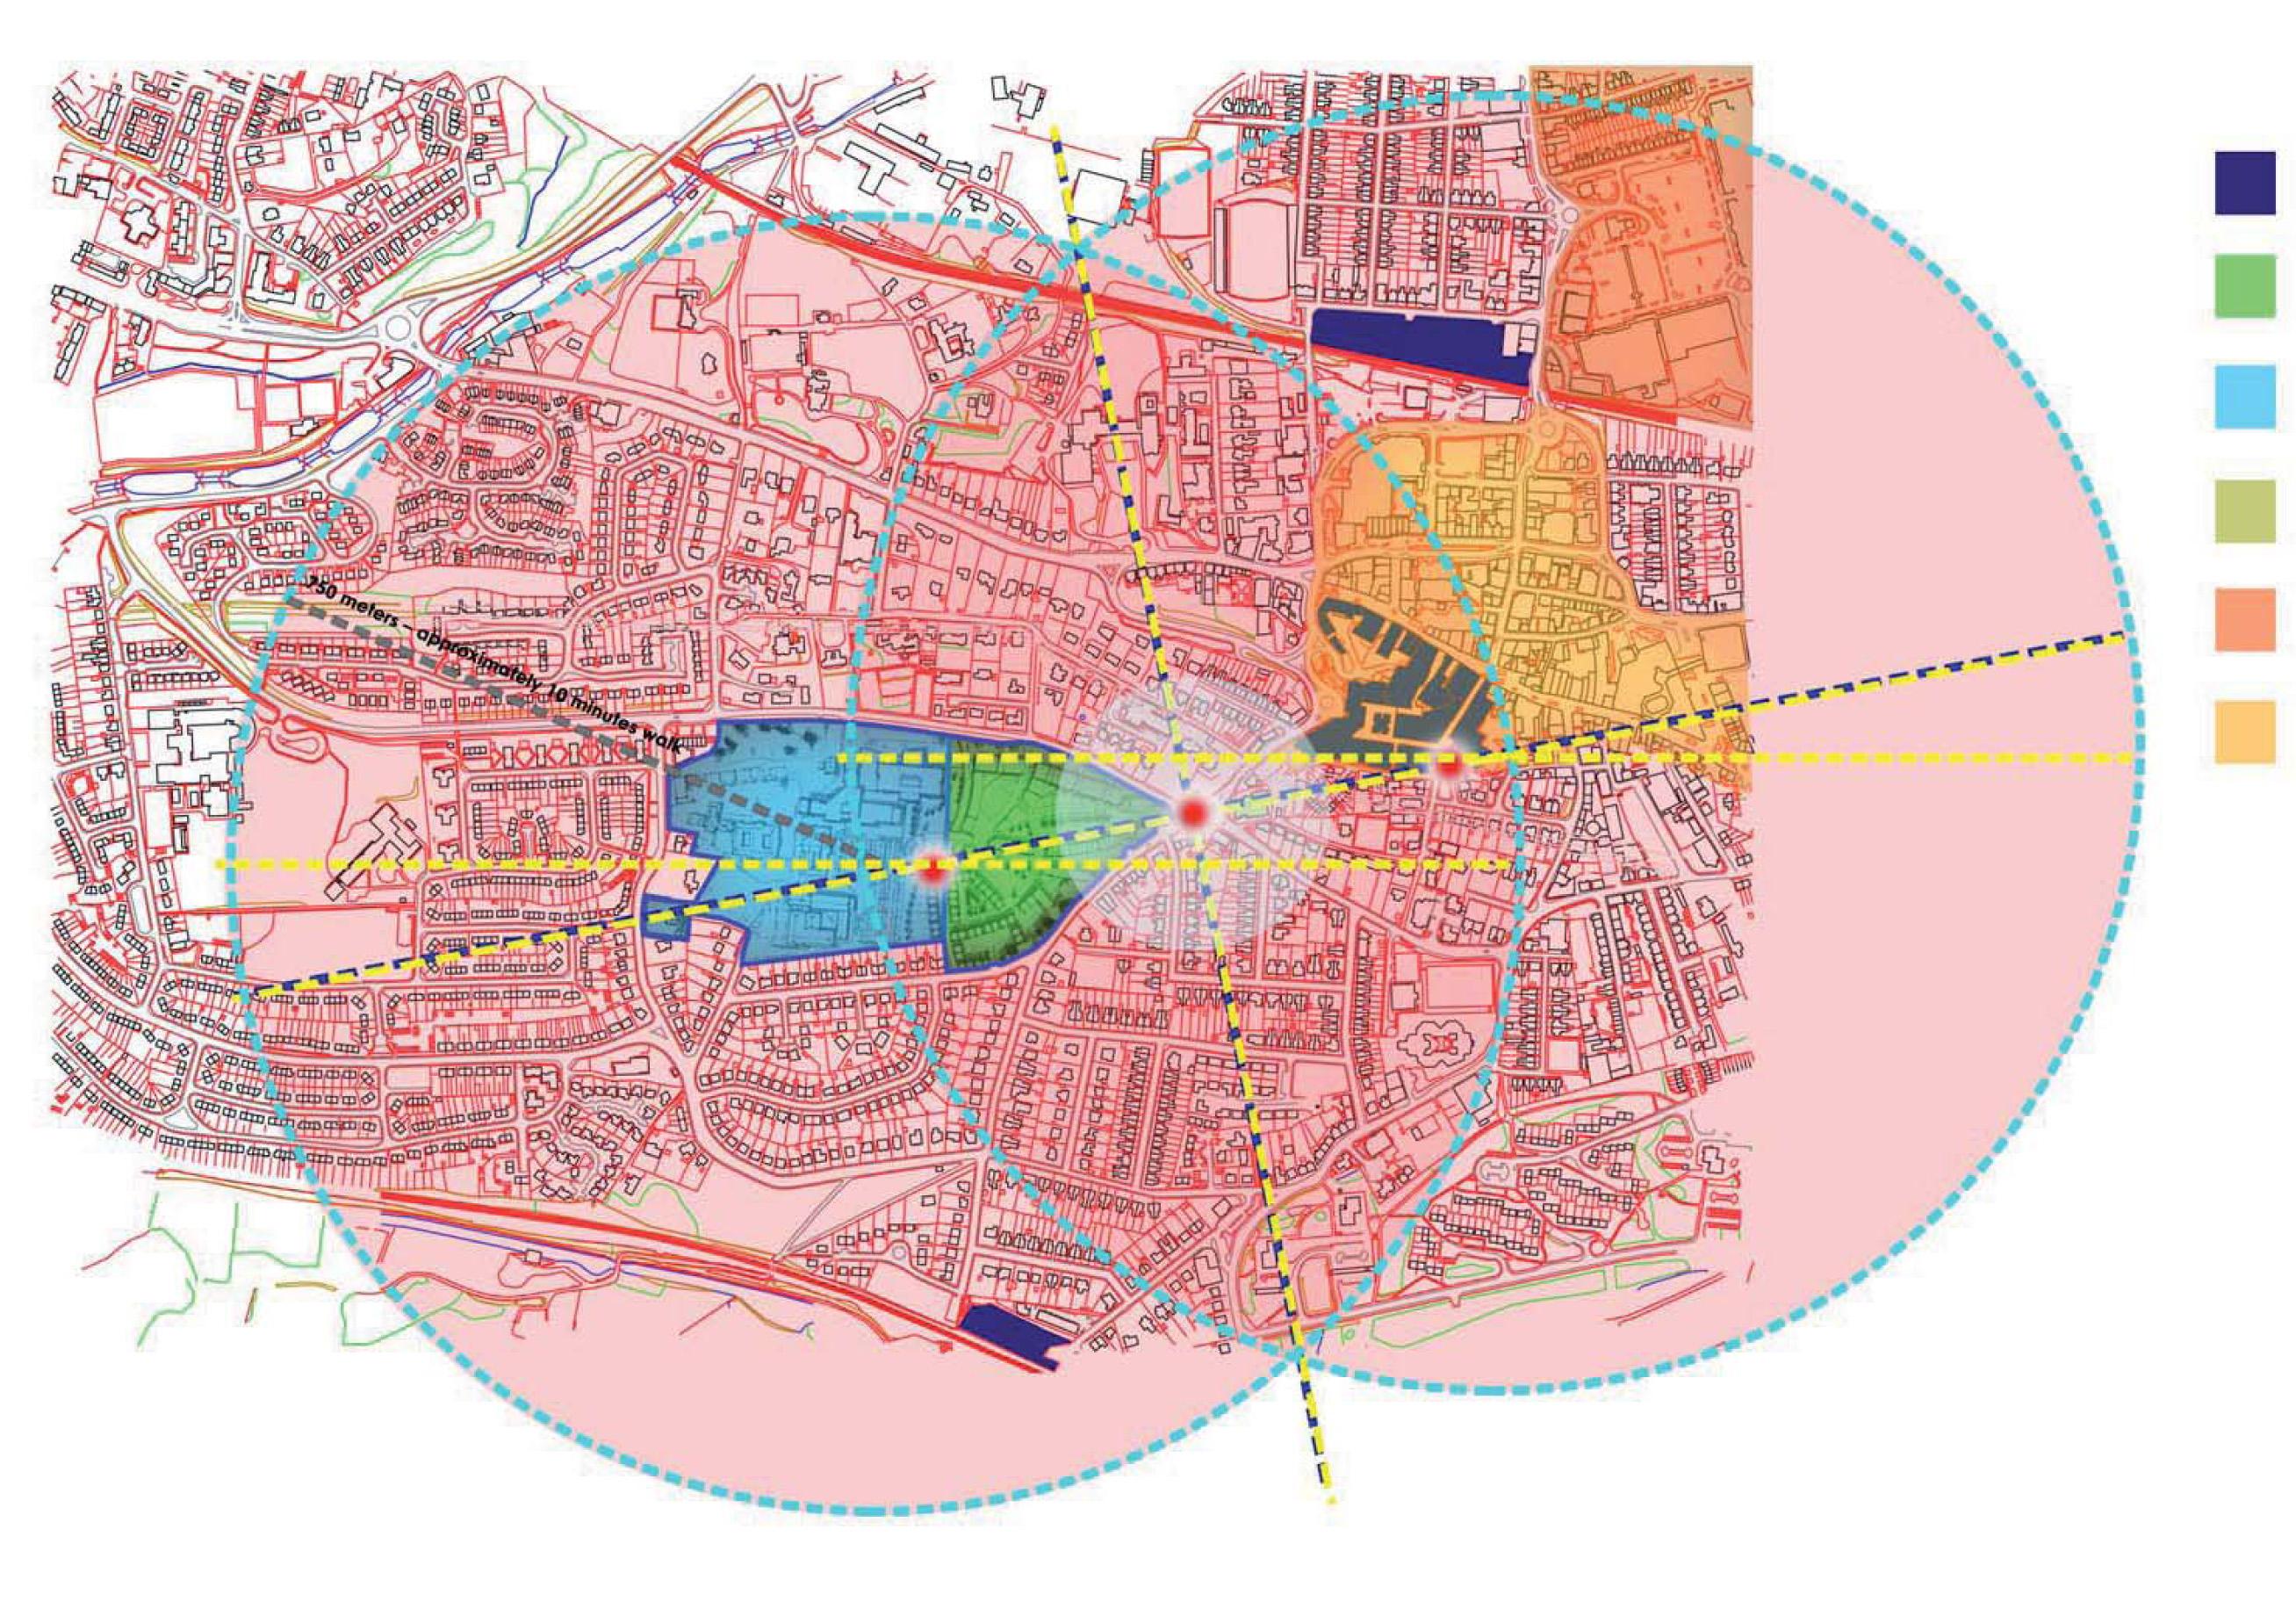 082702 Masterplanning p31.jpg